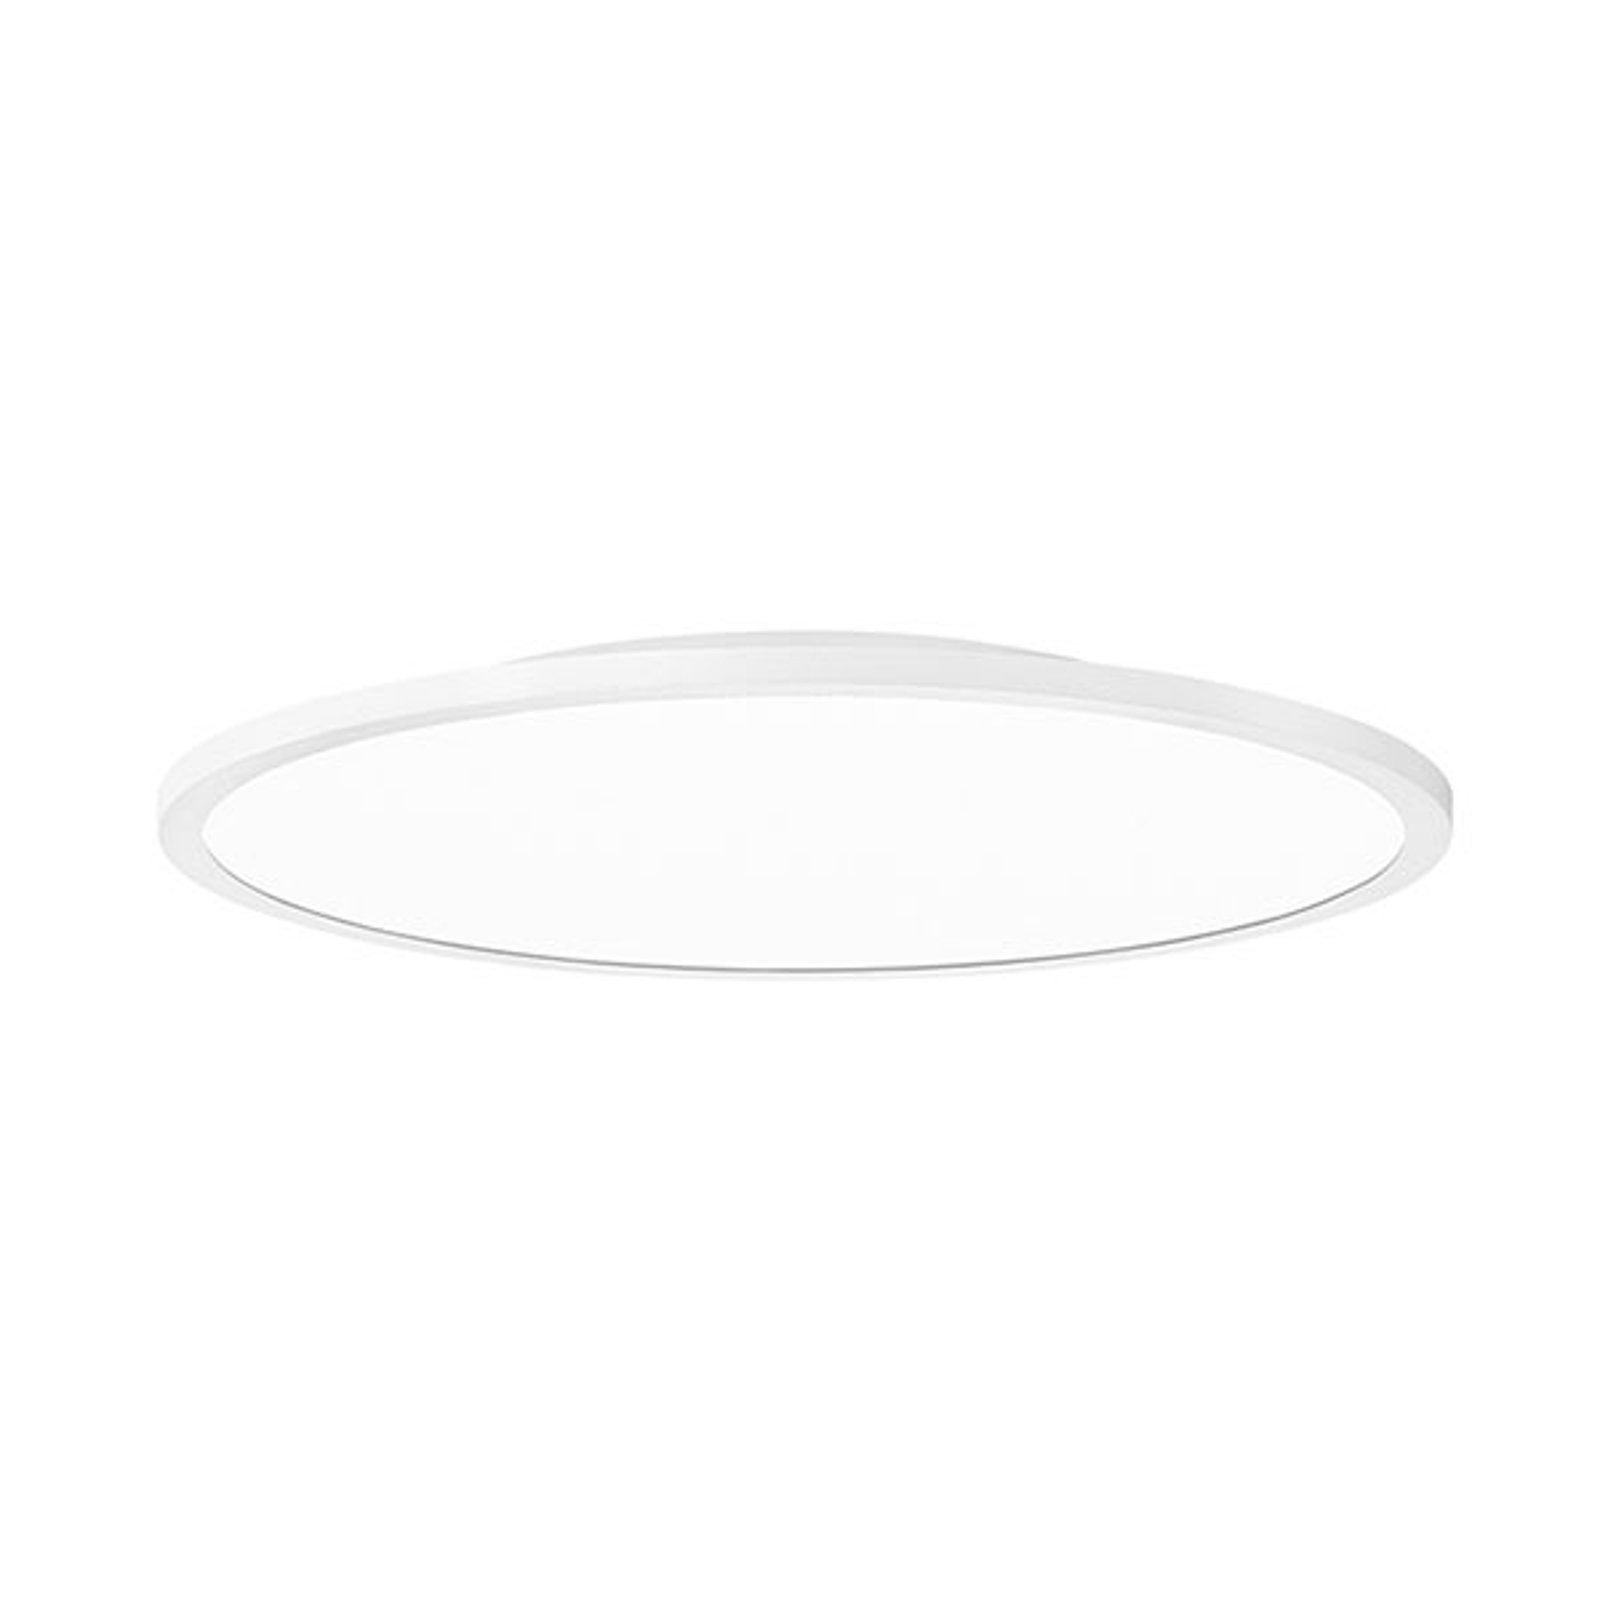 Lampa sufitowa LED FL555AB Ø55 DALI 6500lm 4000K